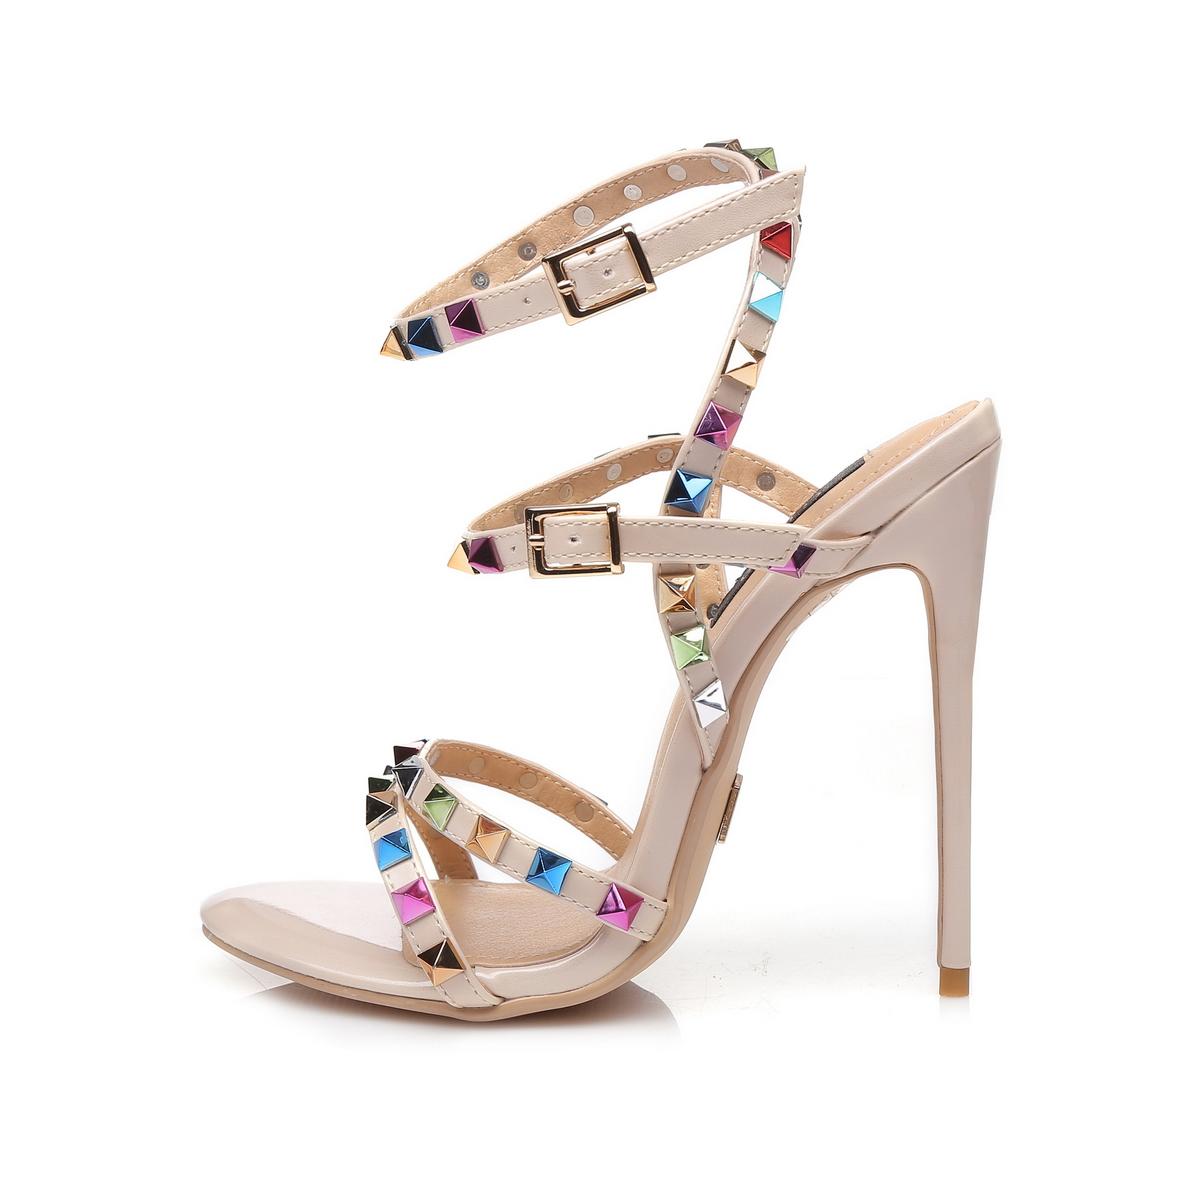 GIARO - Damen High Heel Sandalatten - Hautfarbend Schuhe in Übergrößen – Bild 2